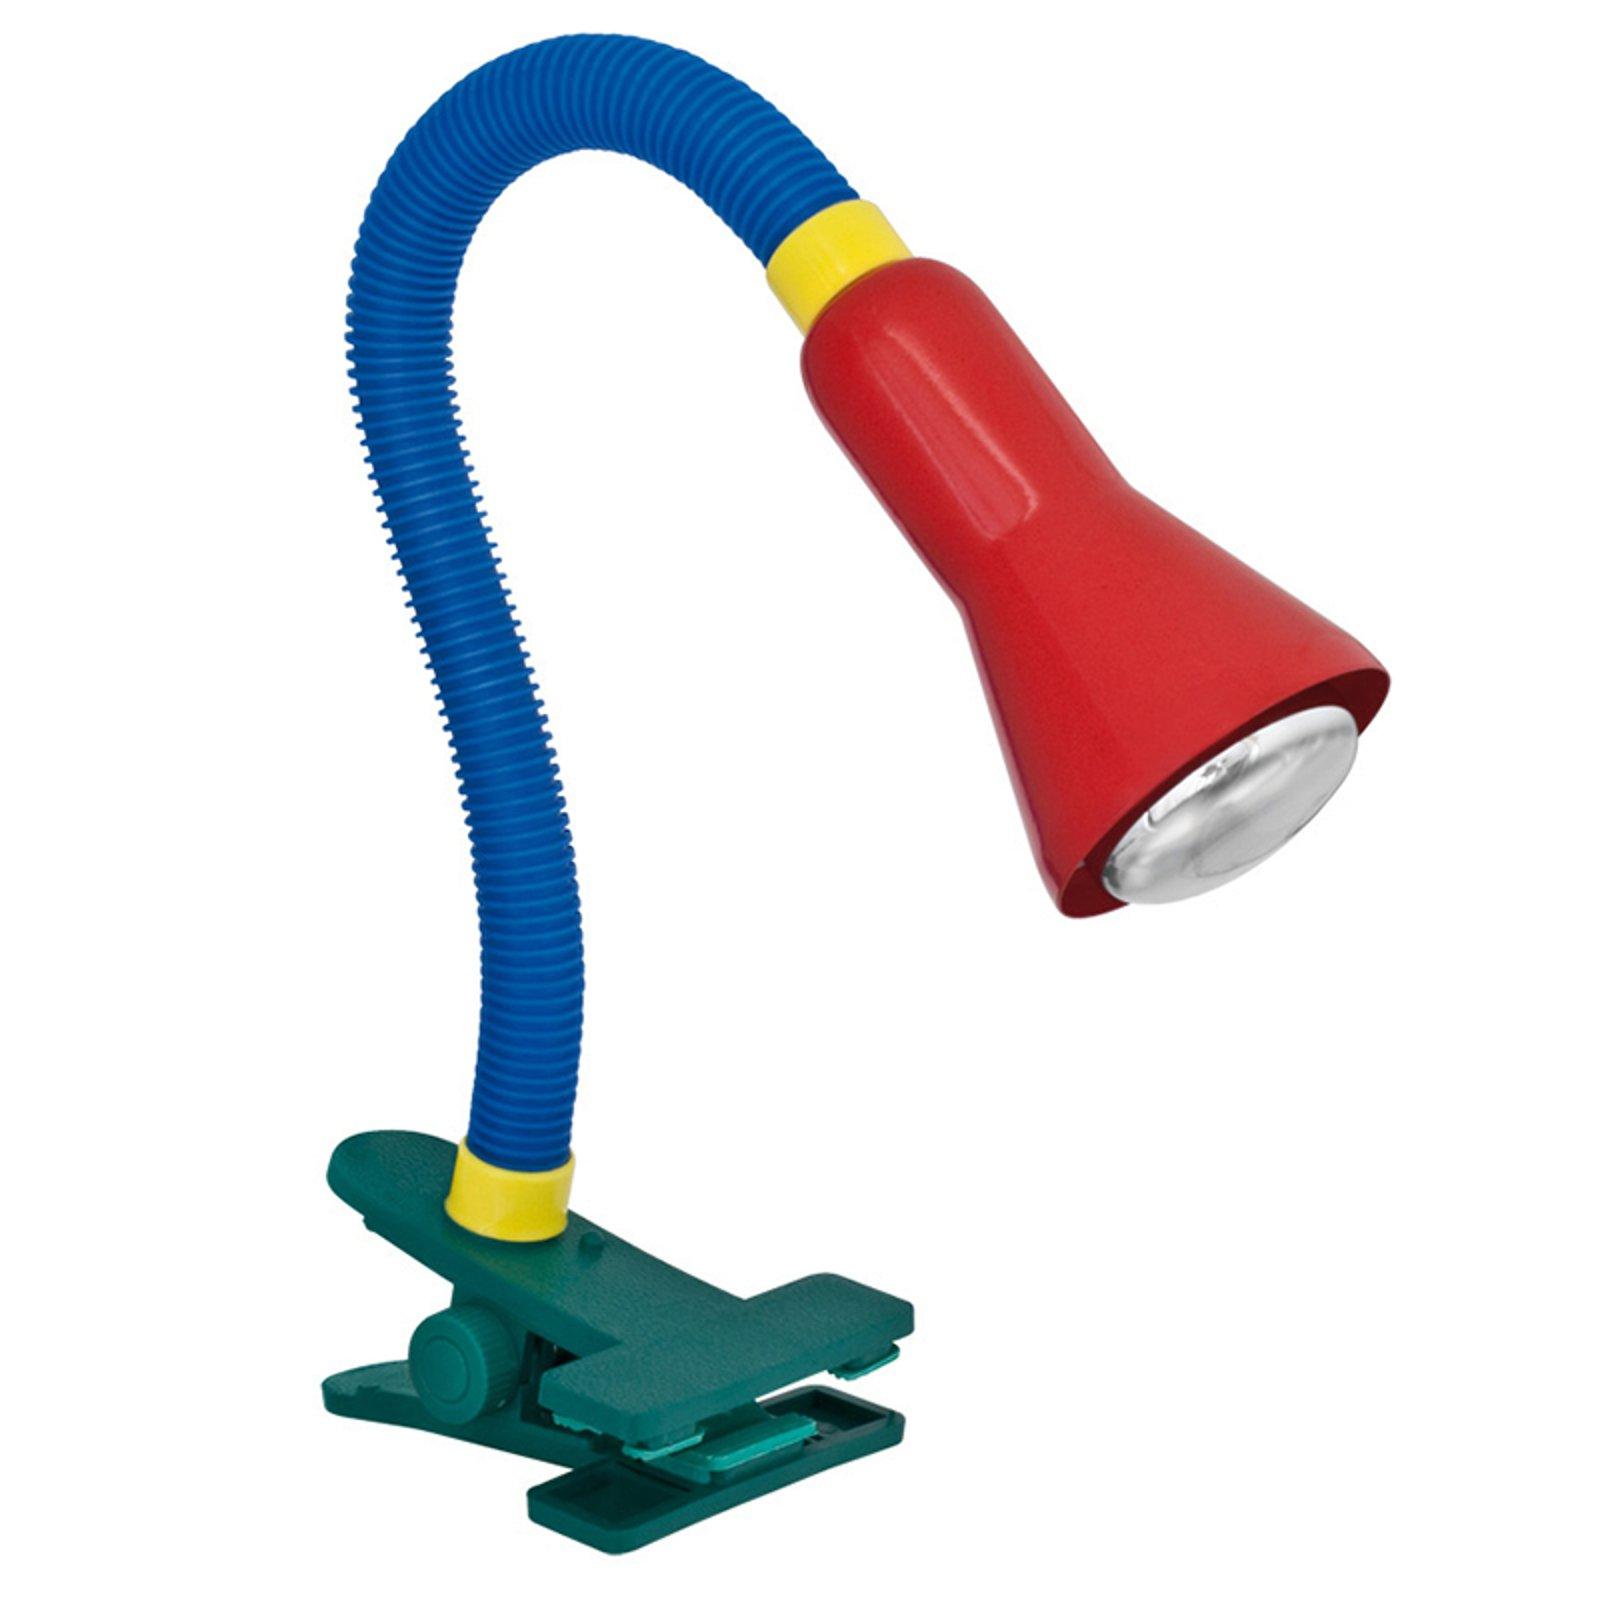 Fargerik bordlampe Couleur med klemmefot